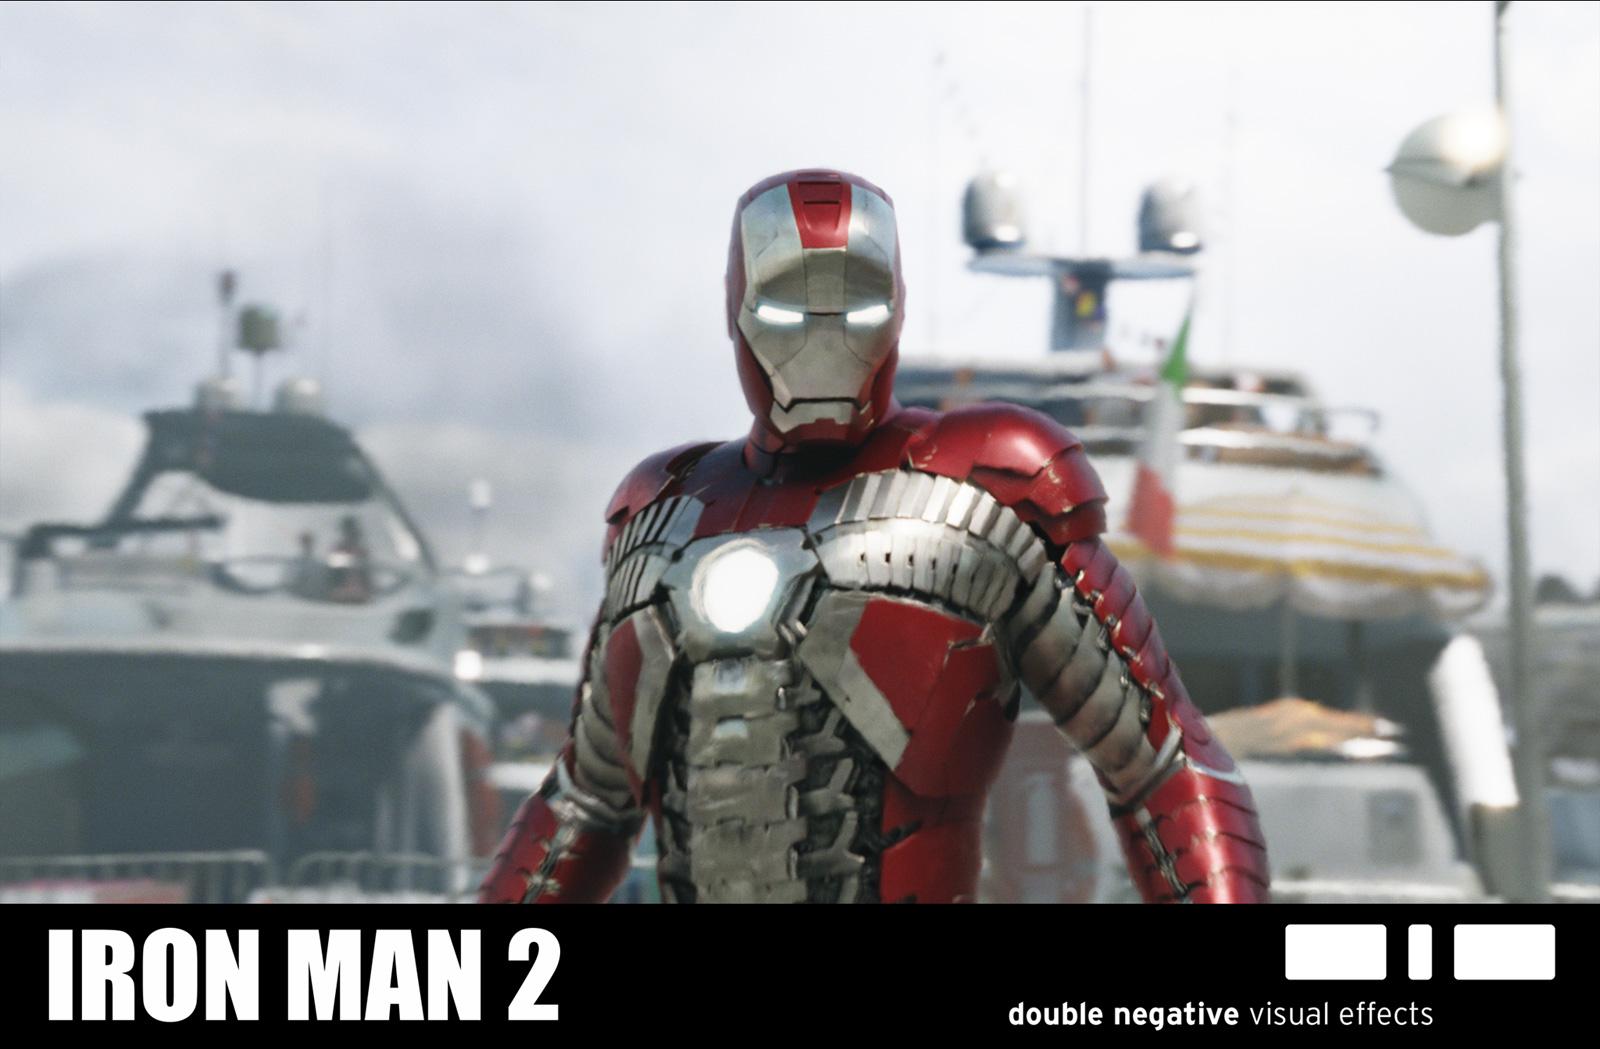 Iron Man 2: IRON MAN 2: Ged Wright